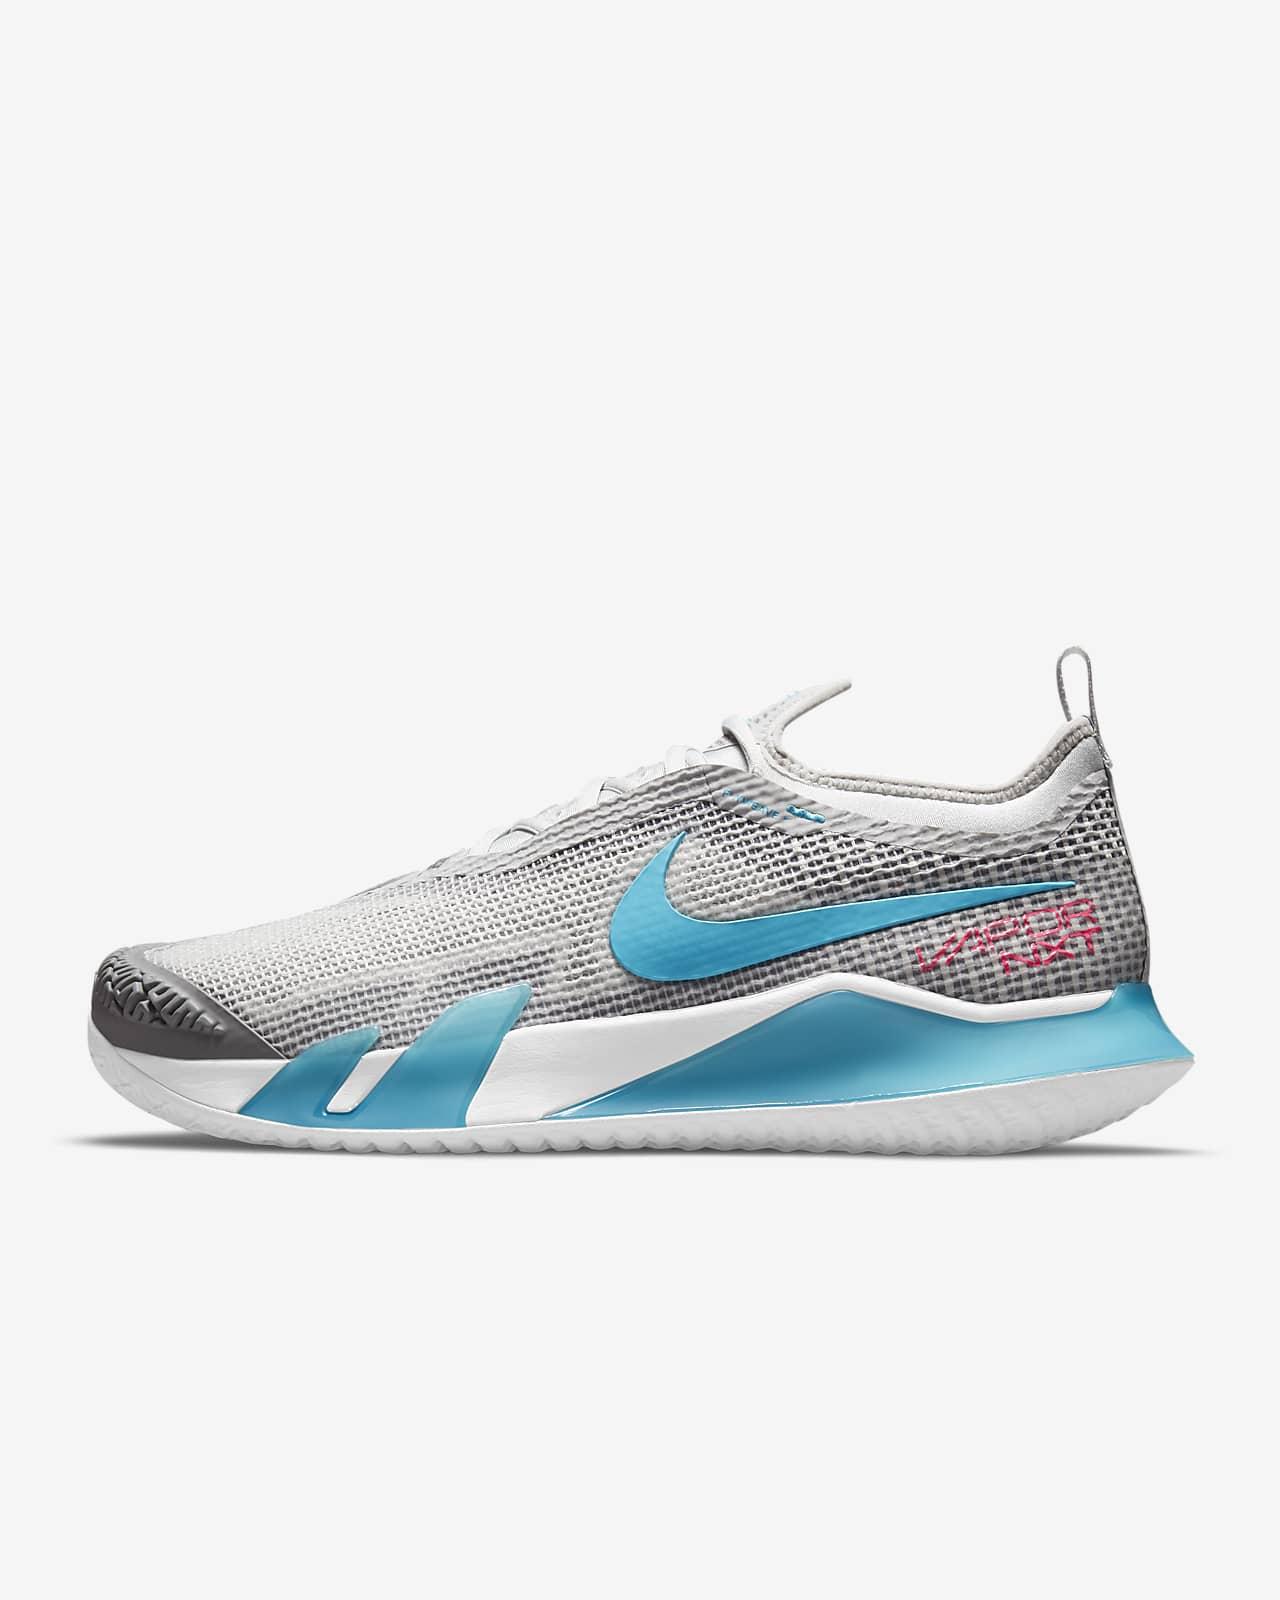 NikeCourt React Vapor NXT Men's Hard Court Tennis Shoes